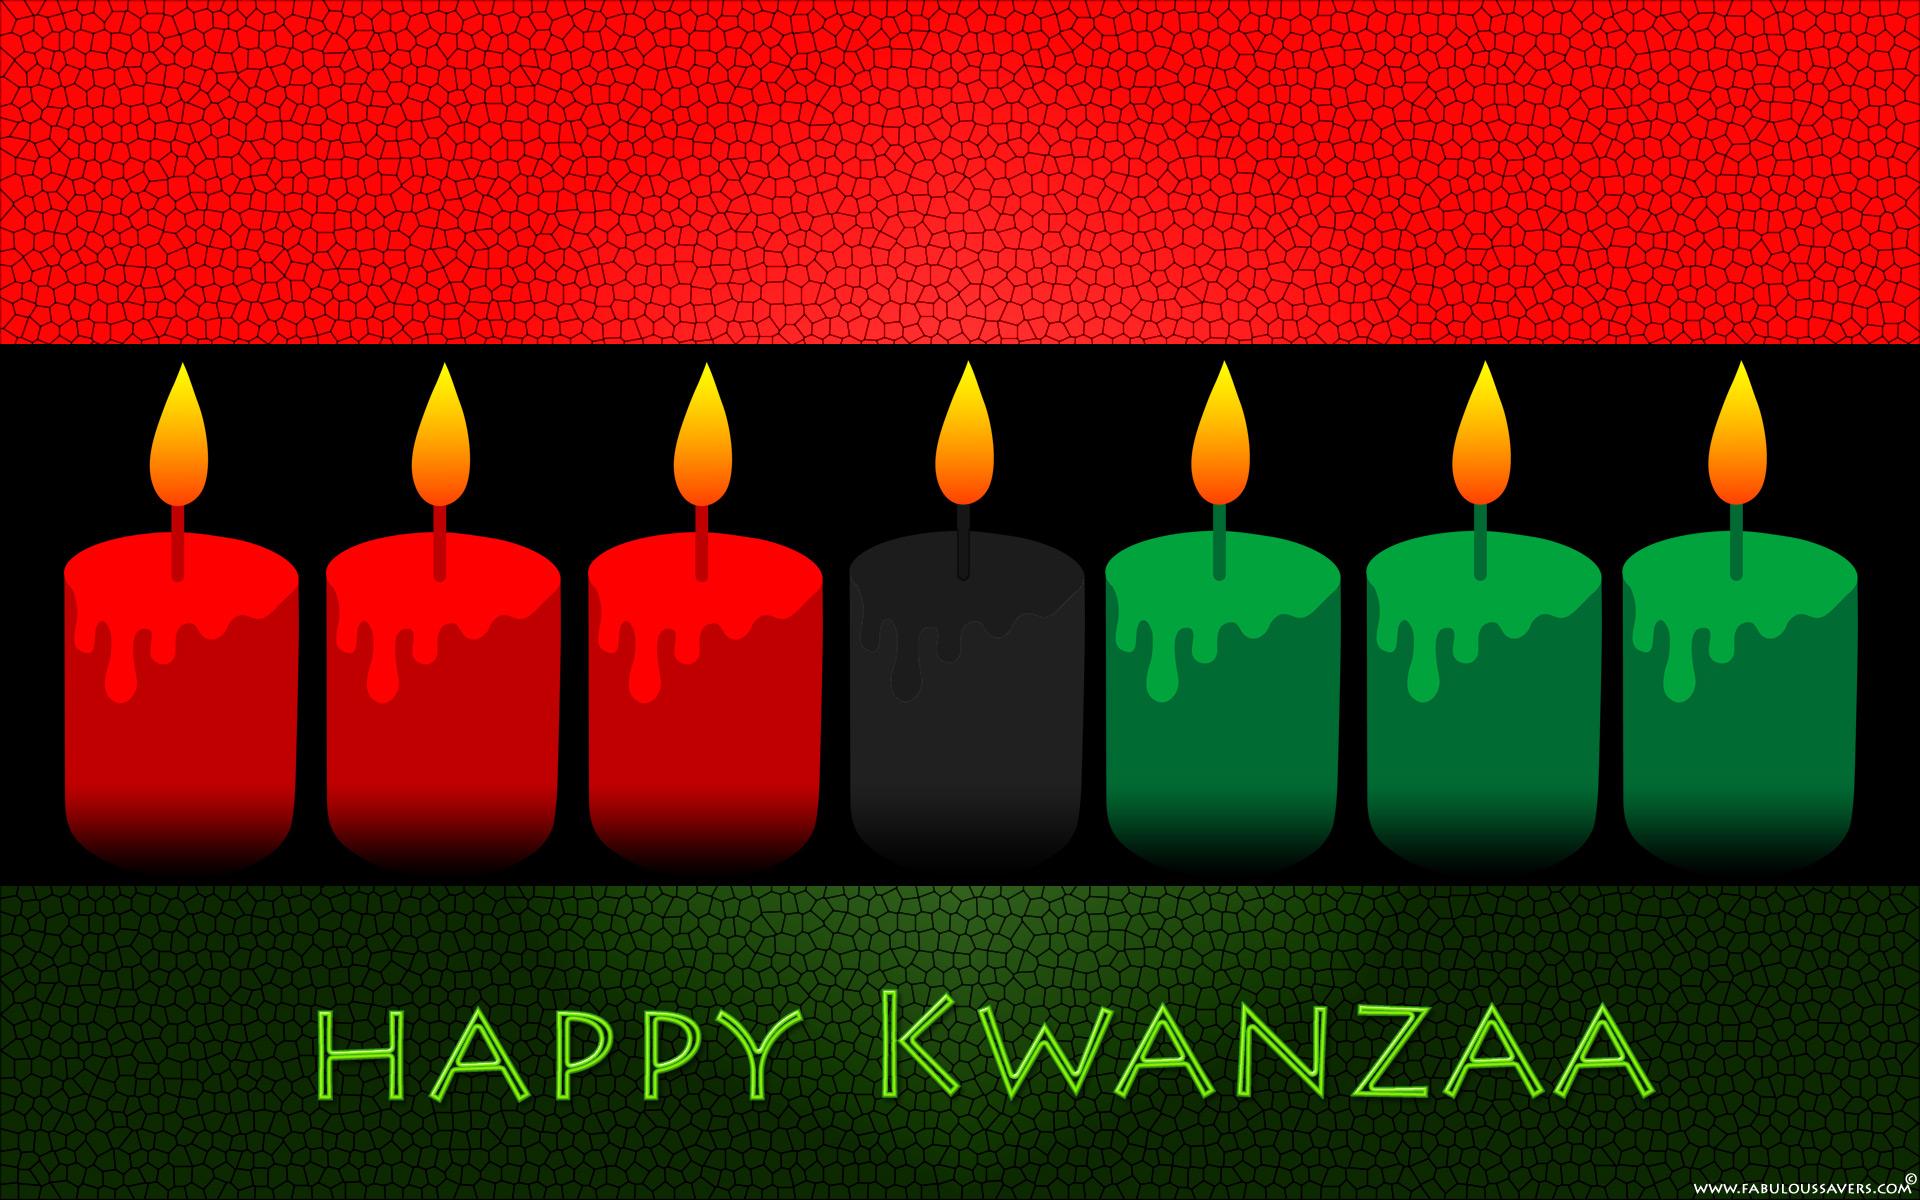 Happy Kwanzaa Day computer desktop wallpaper 1920x1200